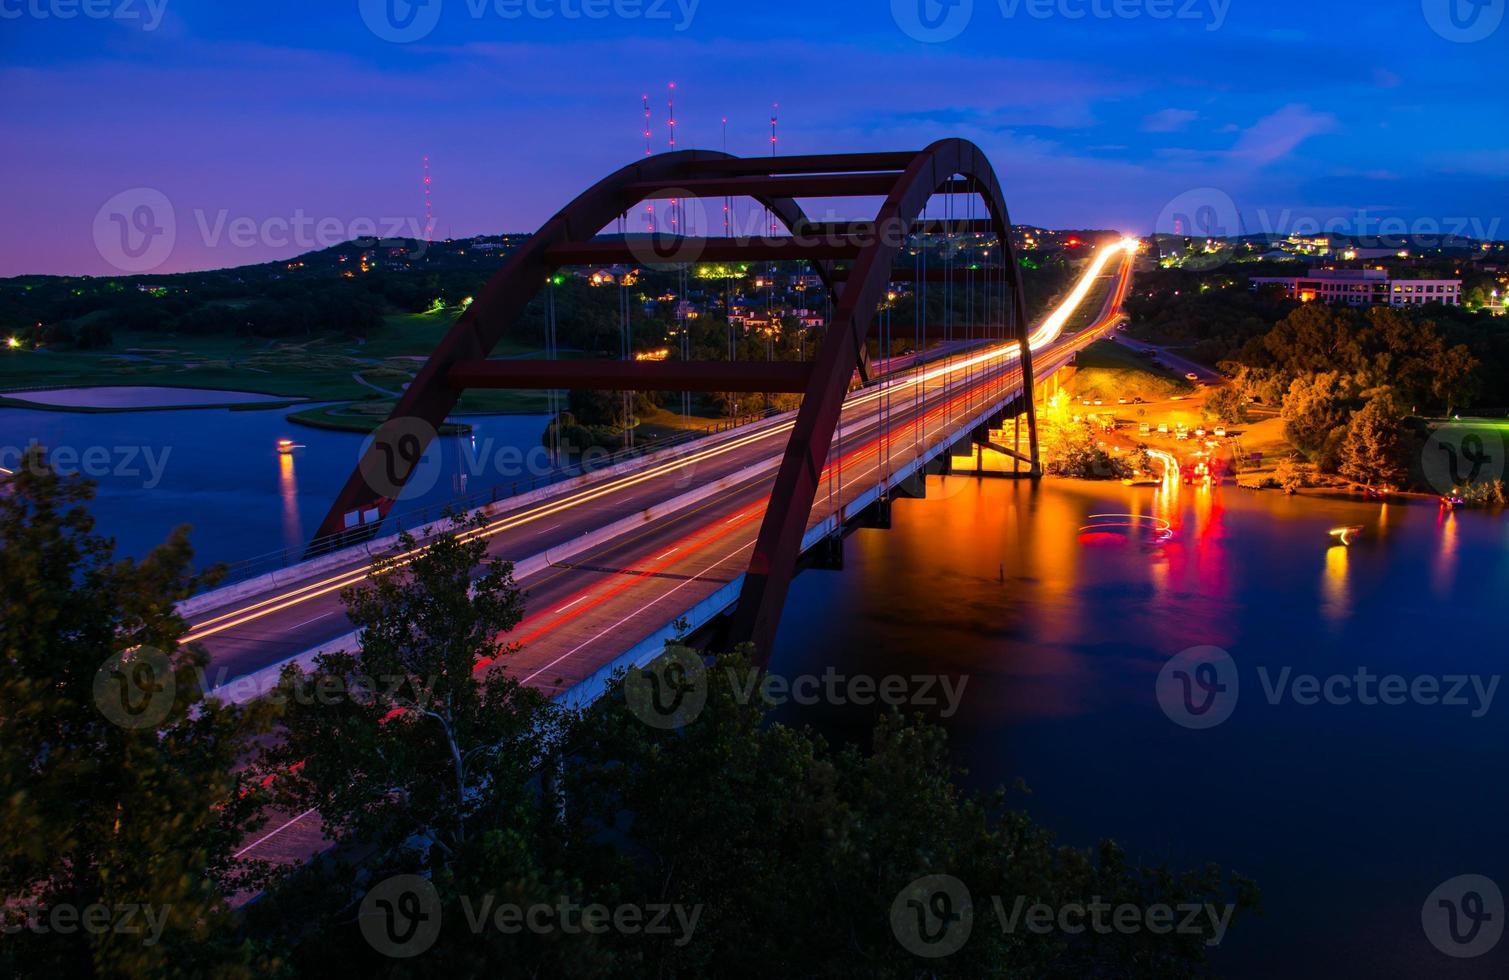 pennybacker loop 360 bridge night shot cirkel tänder austin texas foto